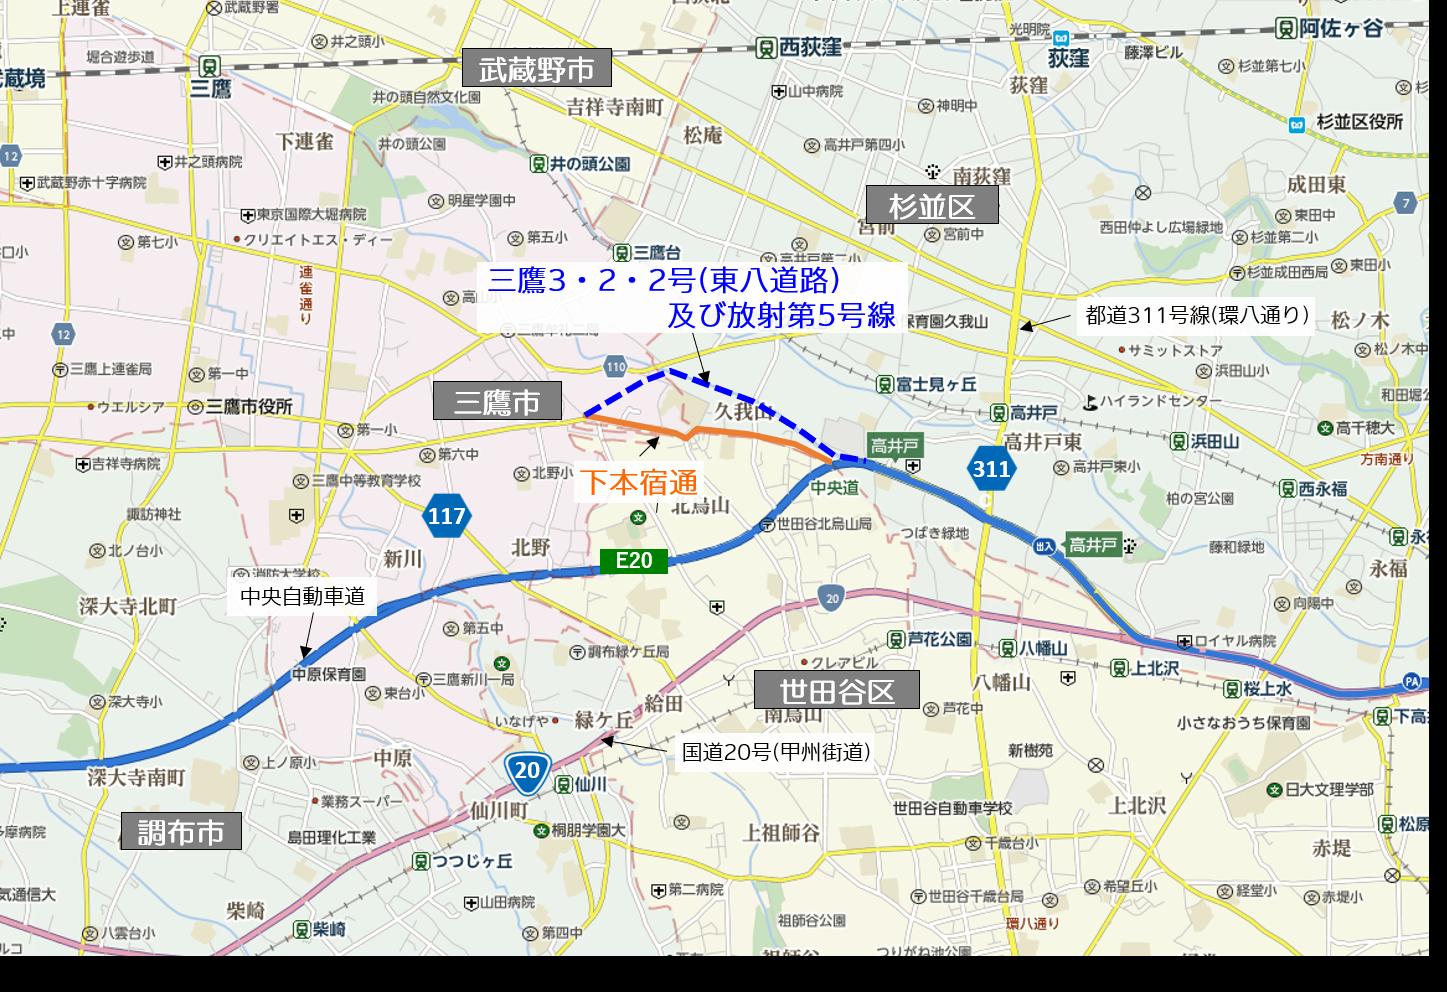 http://corporate.navitime.co.jp/topics/fa55e505992c8824b4424c16c894810af40fb17c.png